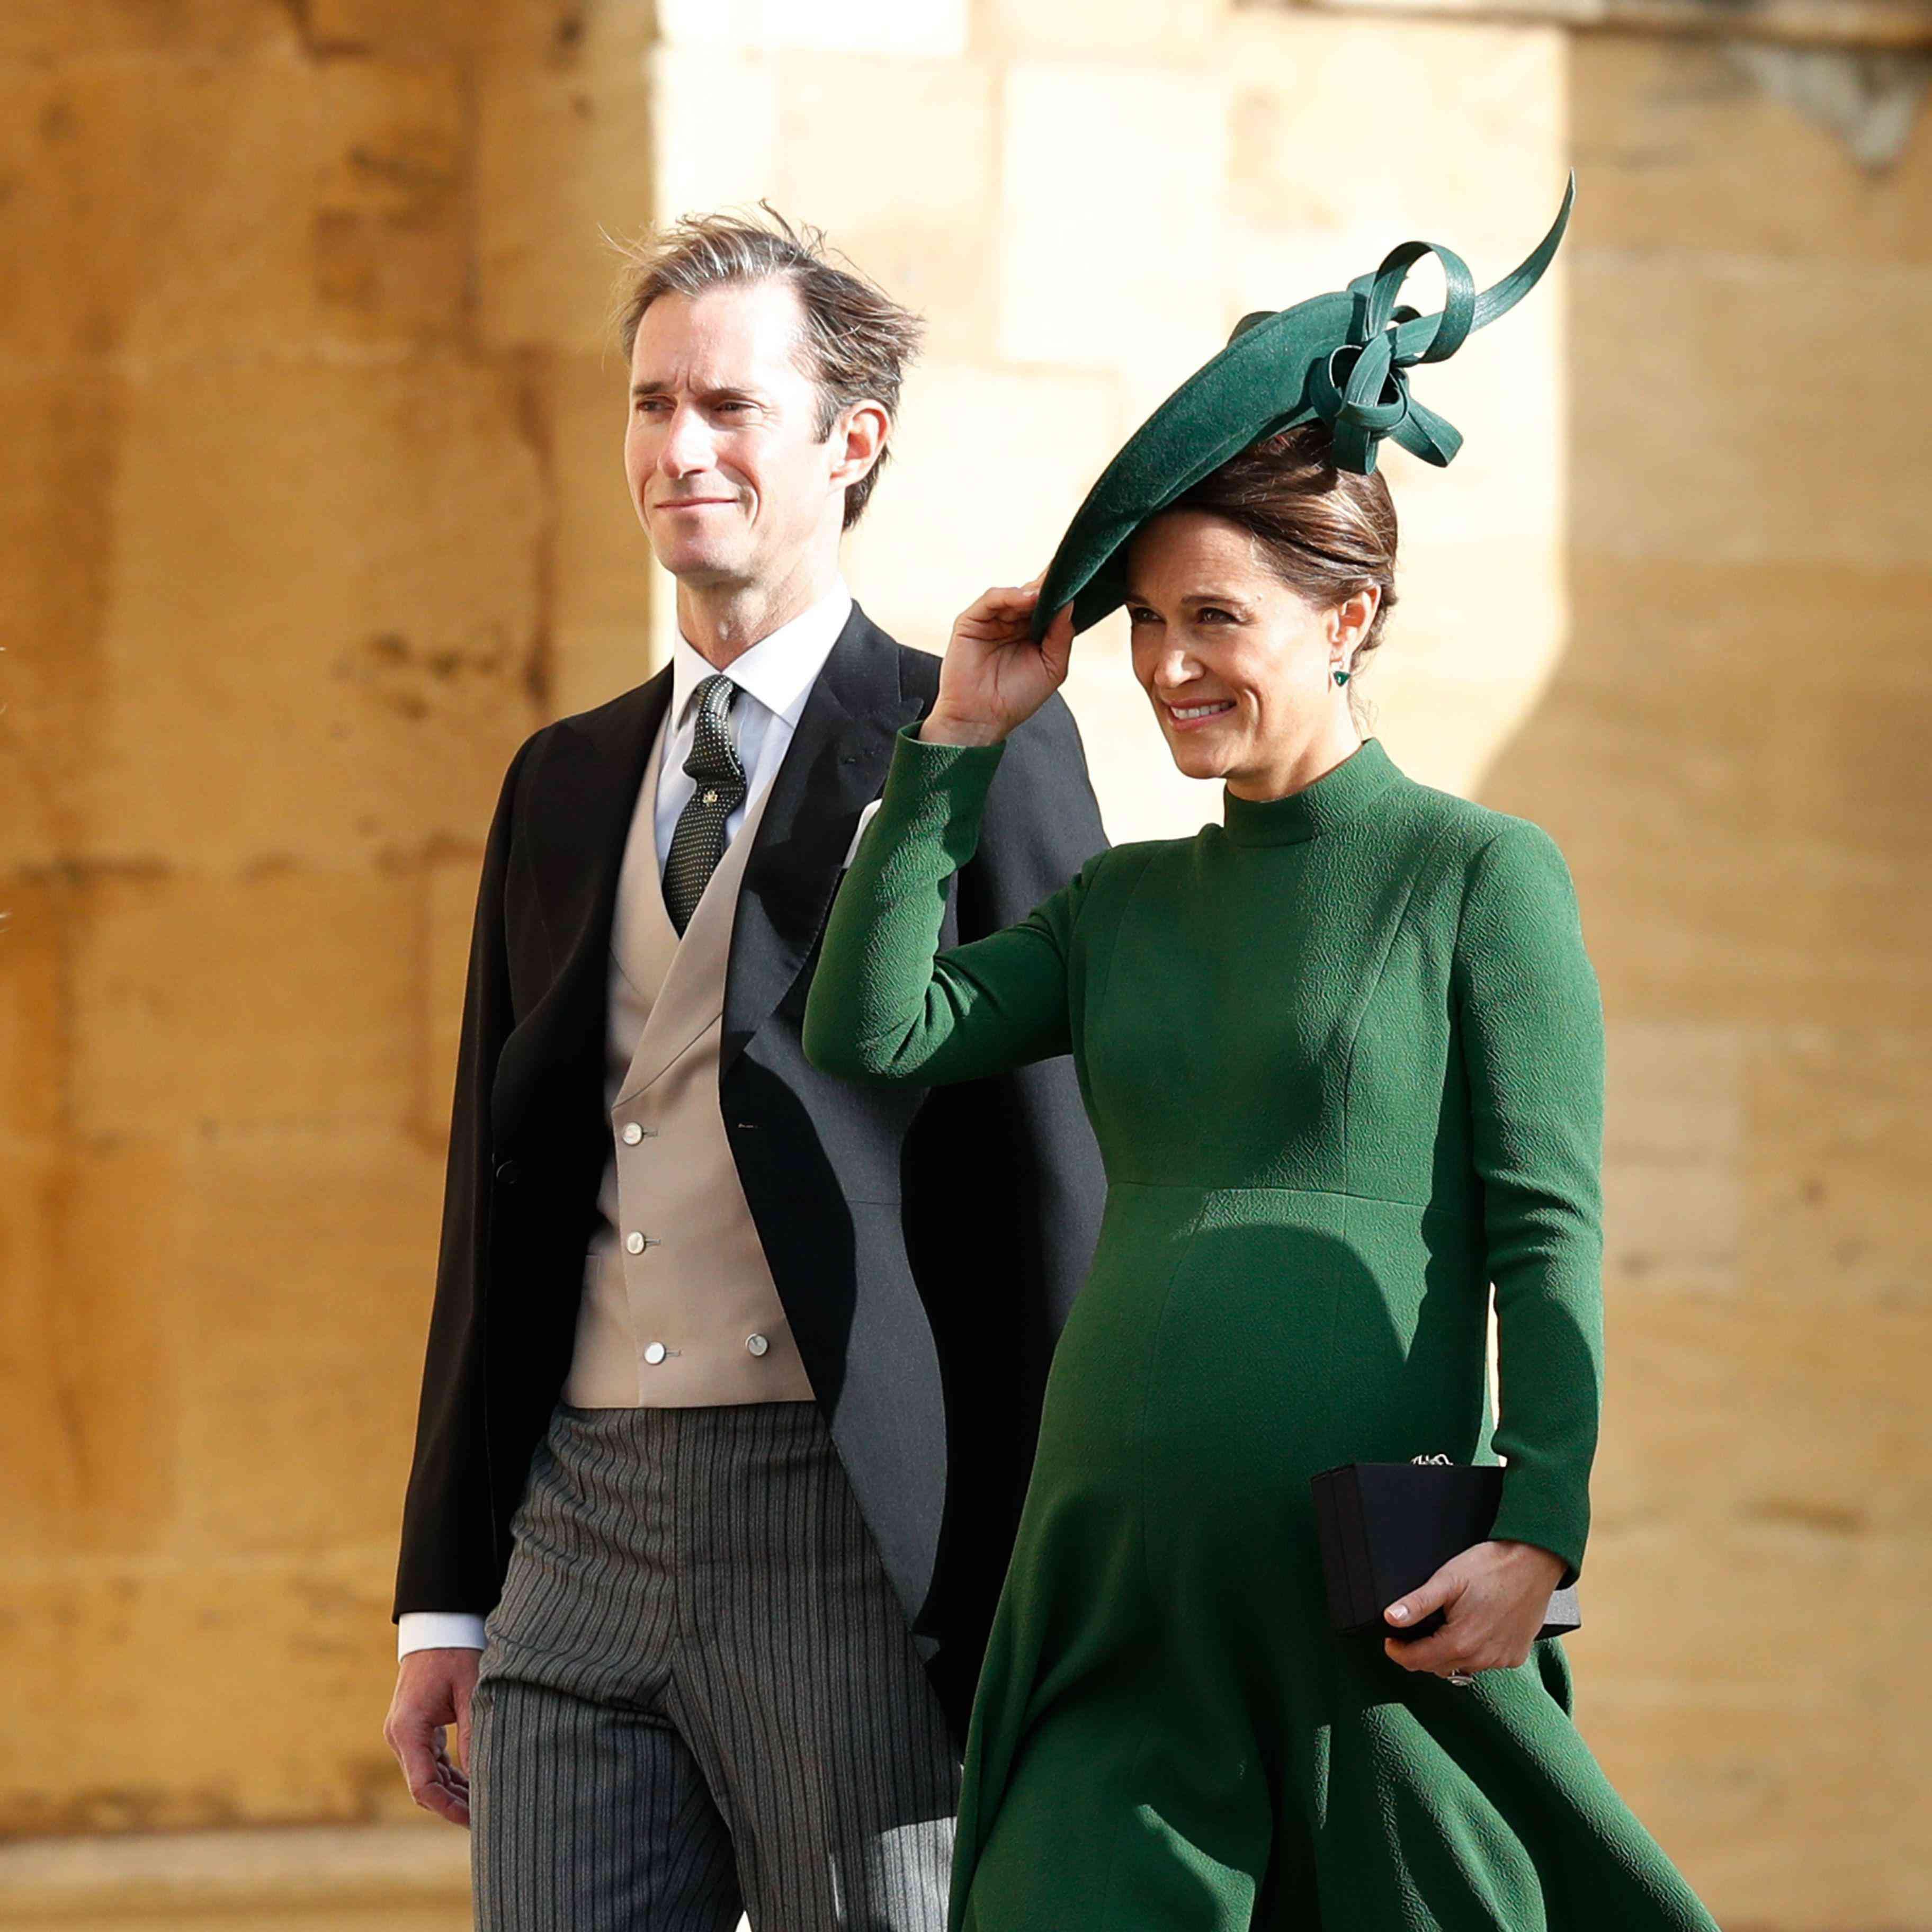 Guests At Royal Wedding.Royal Wedding Guests Princess Eugenie And Jack Brooksbank S